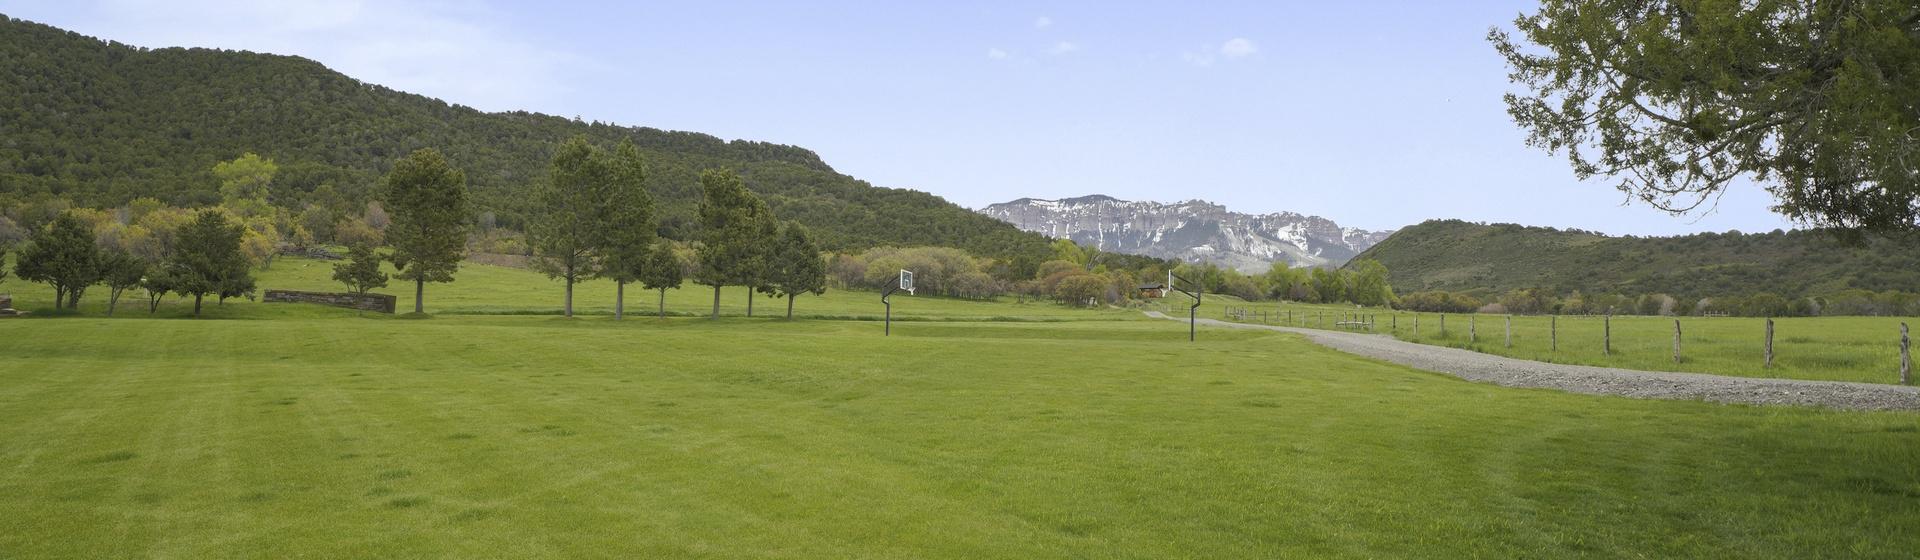 13.10-Telluride-Sleeping-Indian-Ranch-view-4-web.JPG